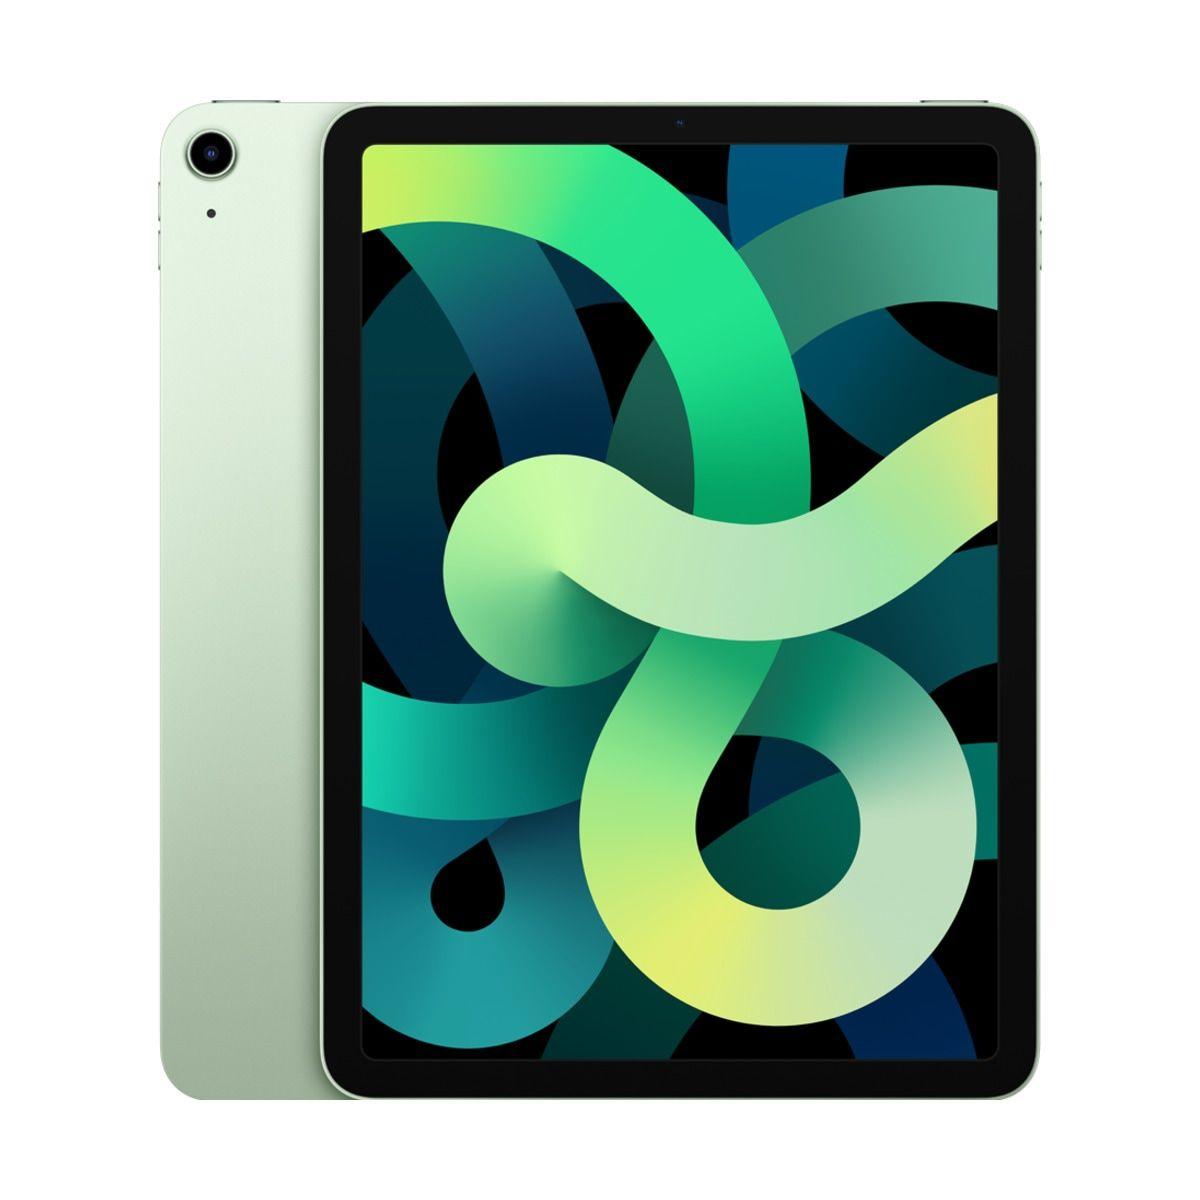 Apple iPad Air Wi-Fi+Cell 64GB - Green